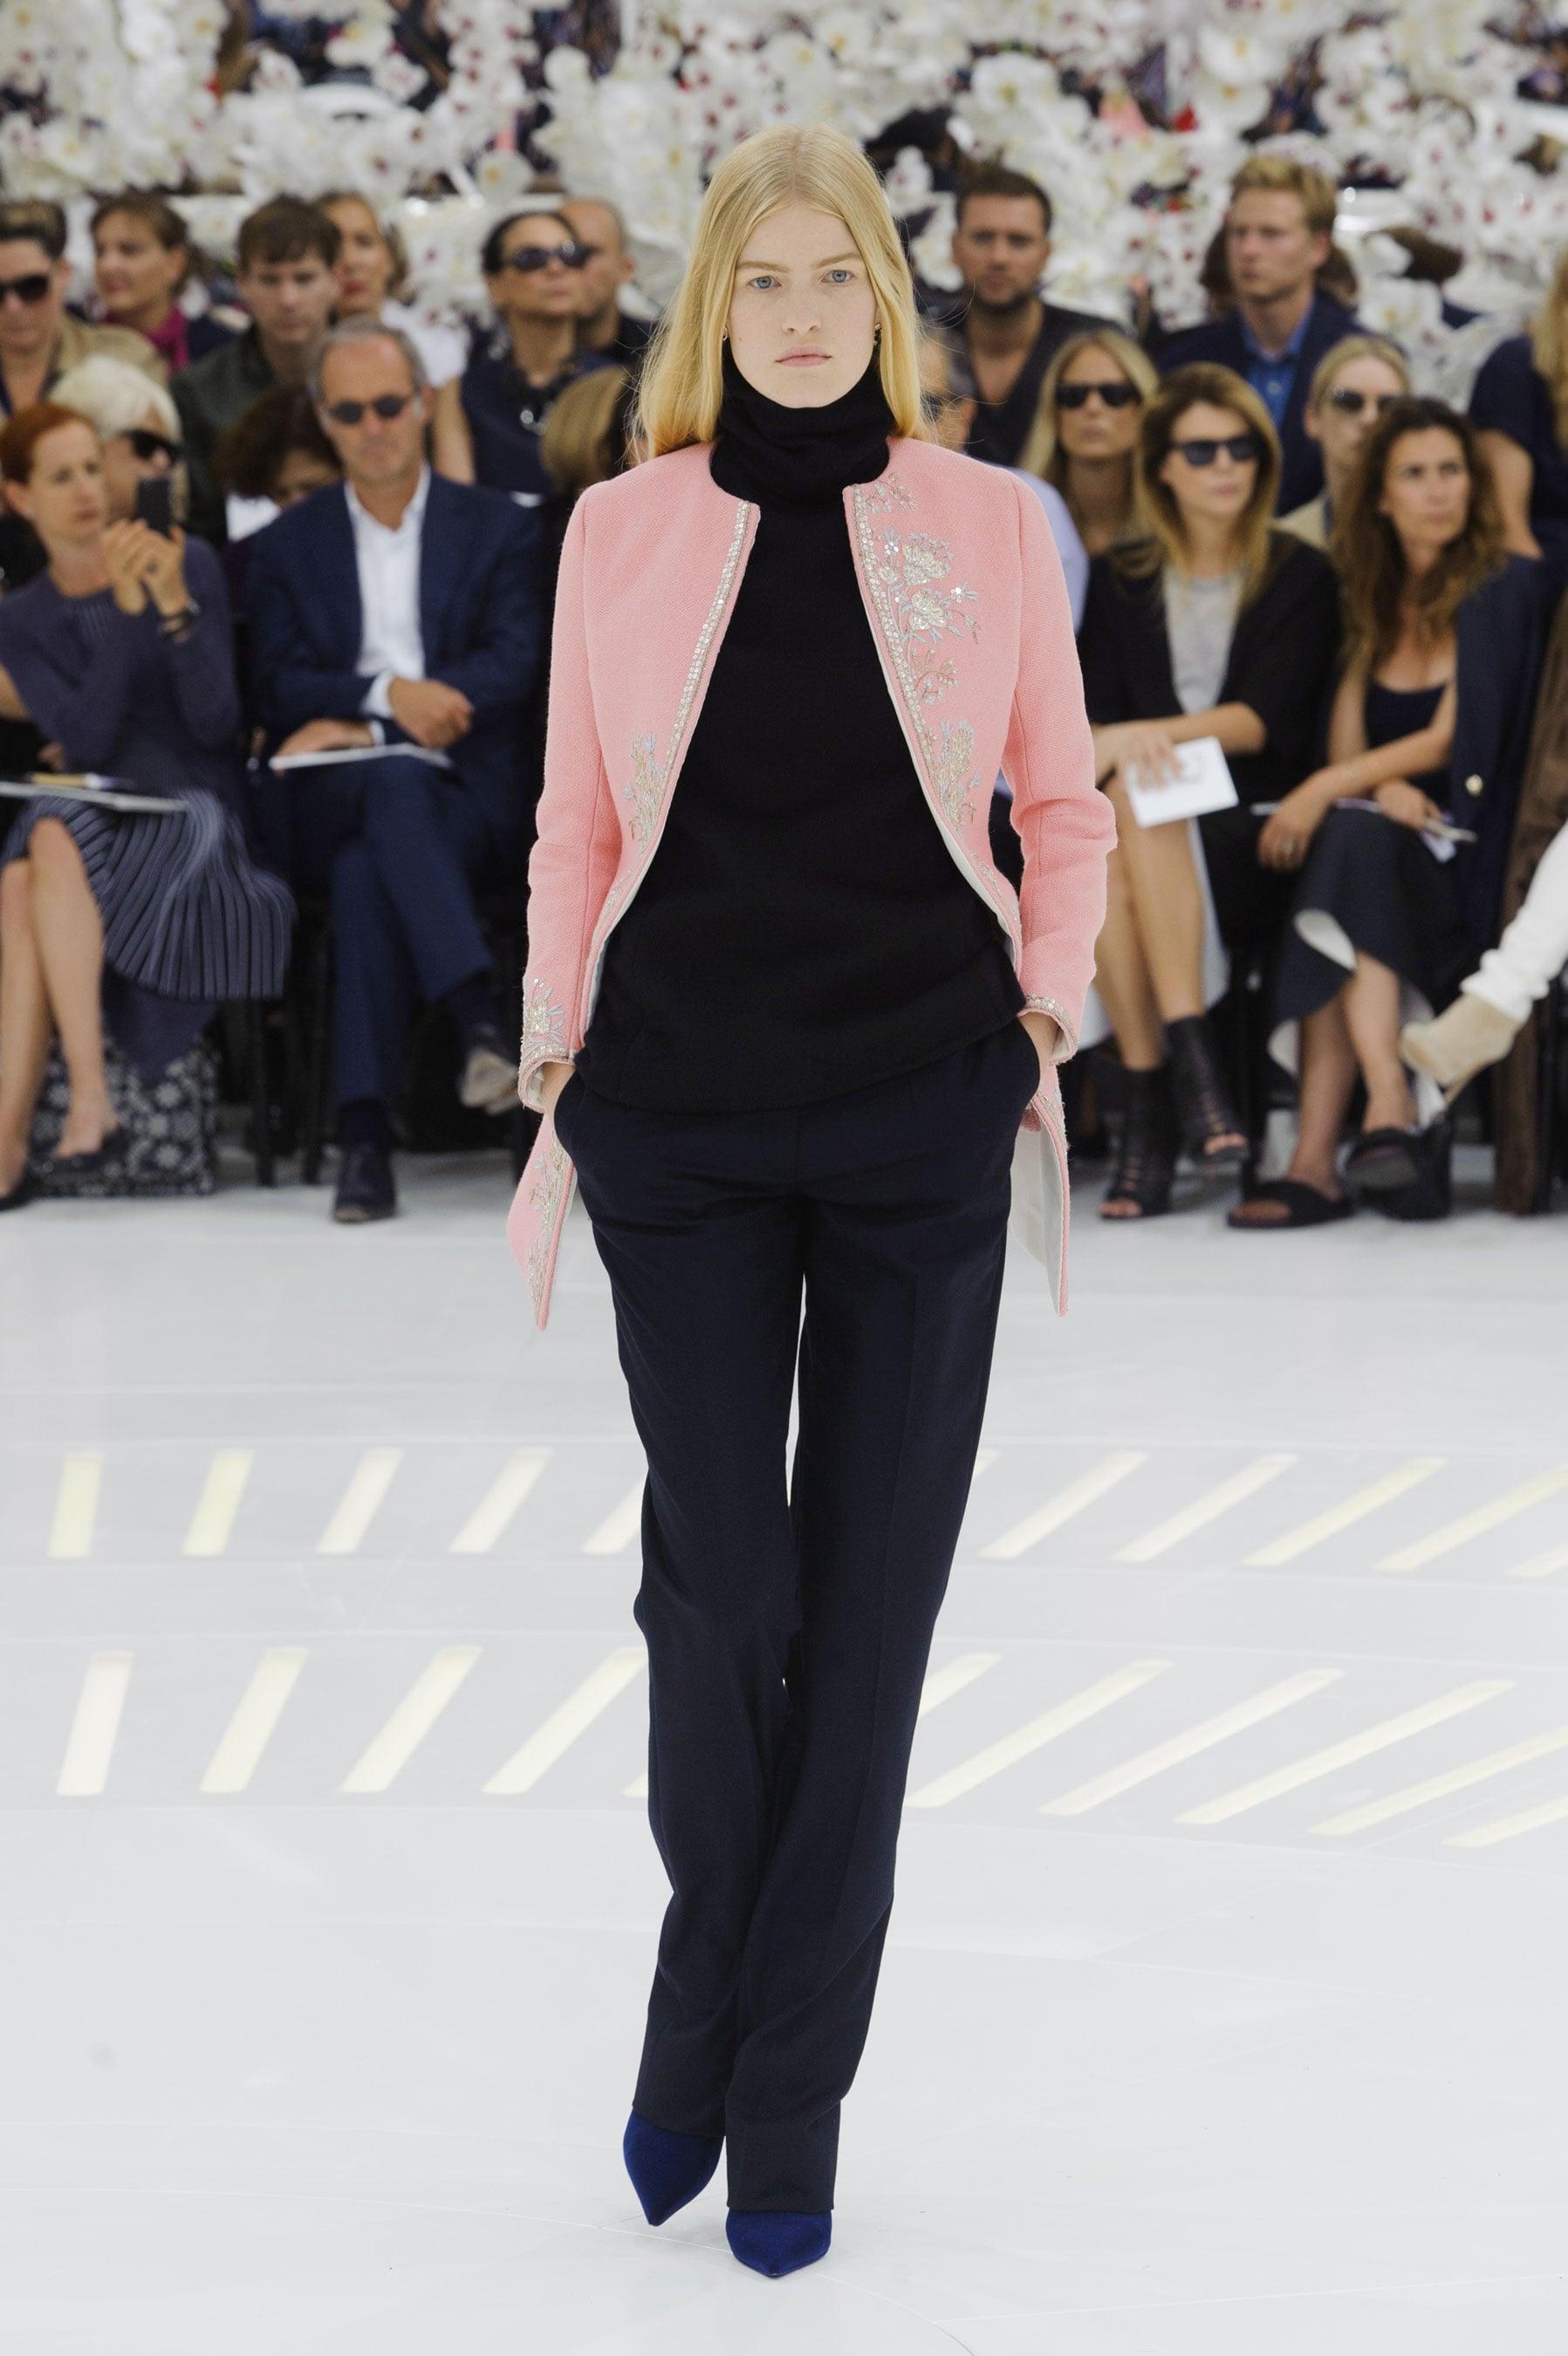 Christian Dior Haute Couture Fall 2014